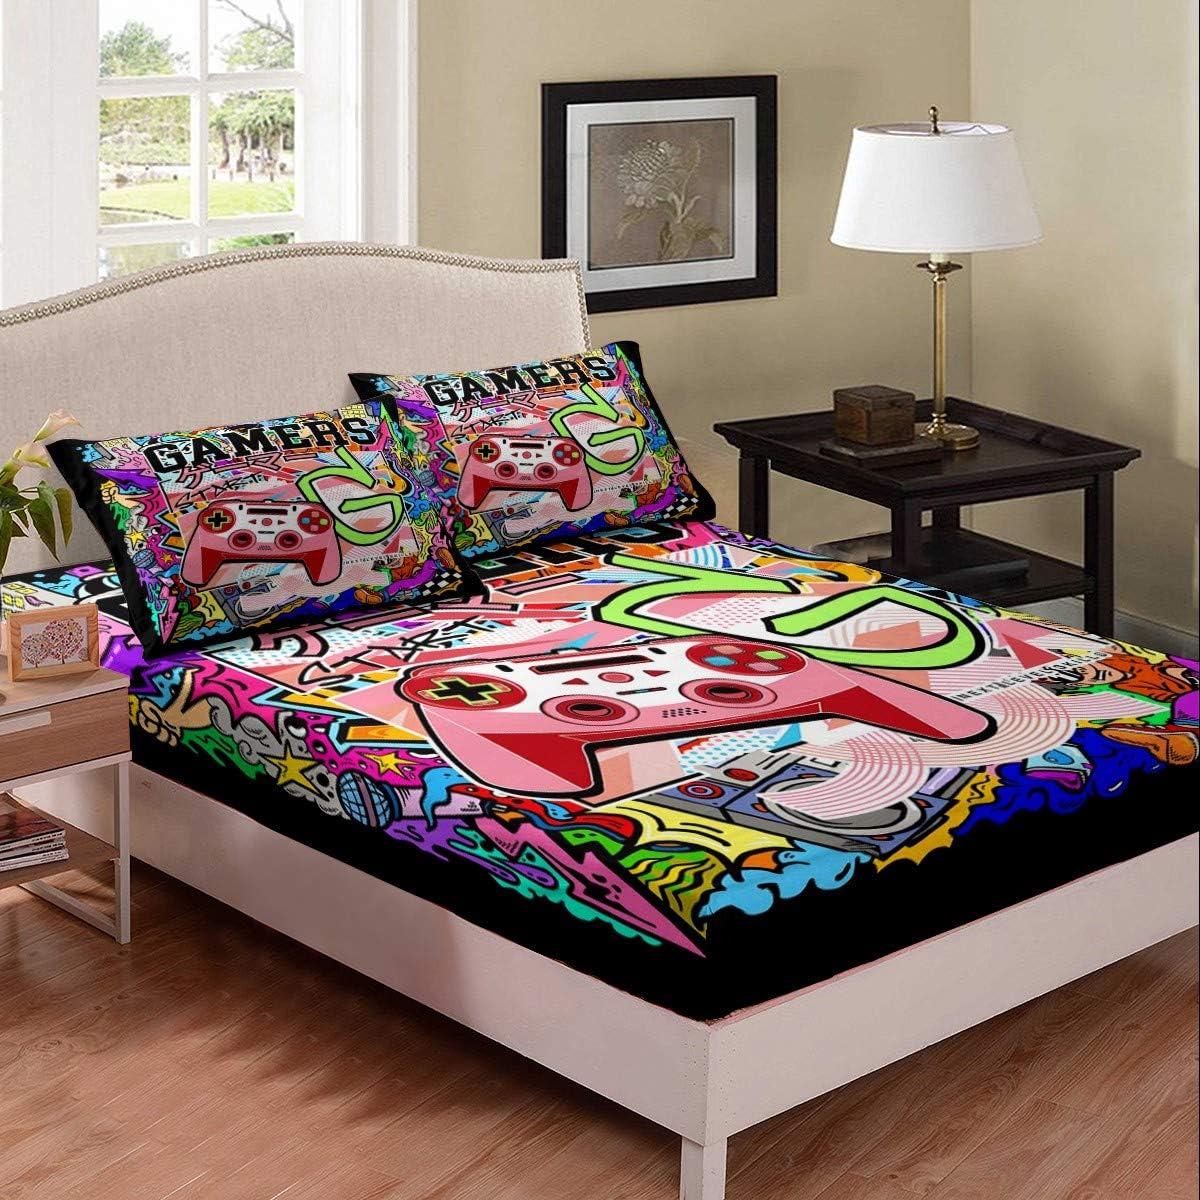 Erosebridal Gamer Bedding Set Pink Gamepad Graffiti Bed Cover Hi いよいよ人気ブランド 新品 送料無料